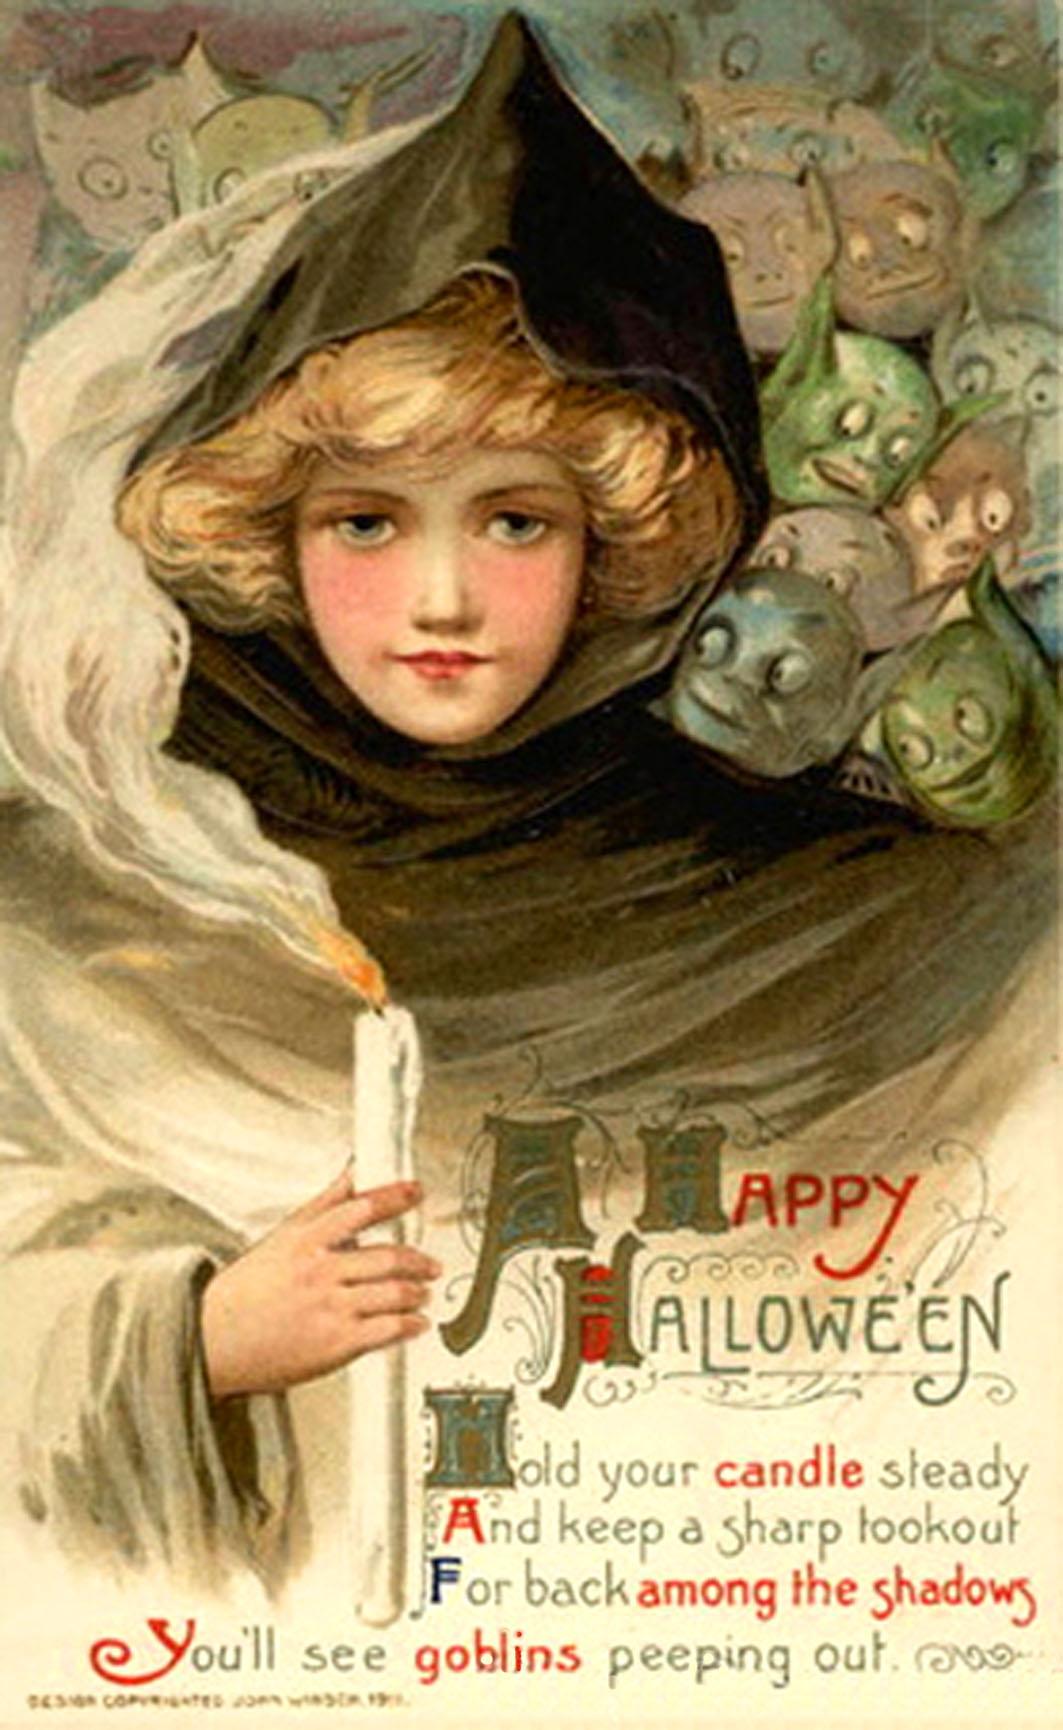 halloween-post-card-by-samuel-l-schmucker-witch-candle-goblins-poem.jpg